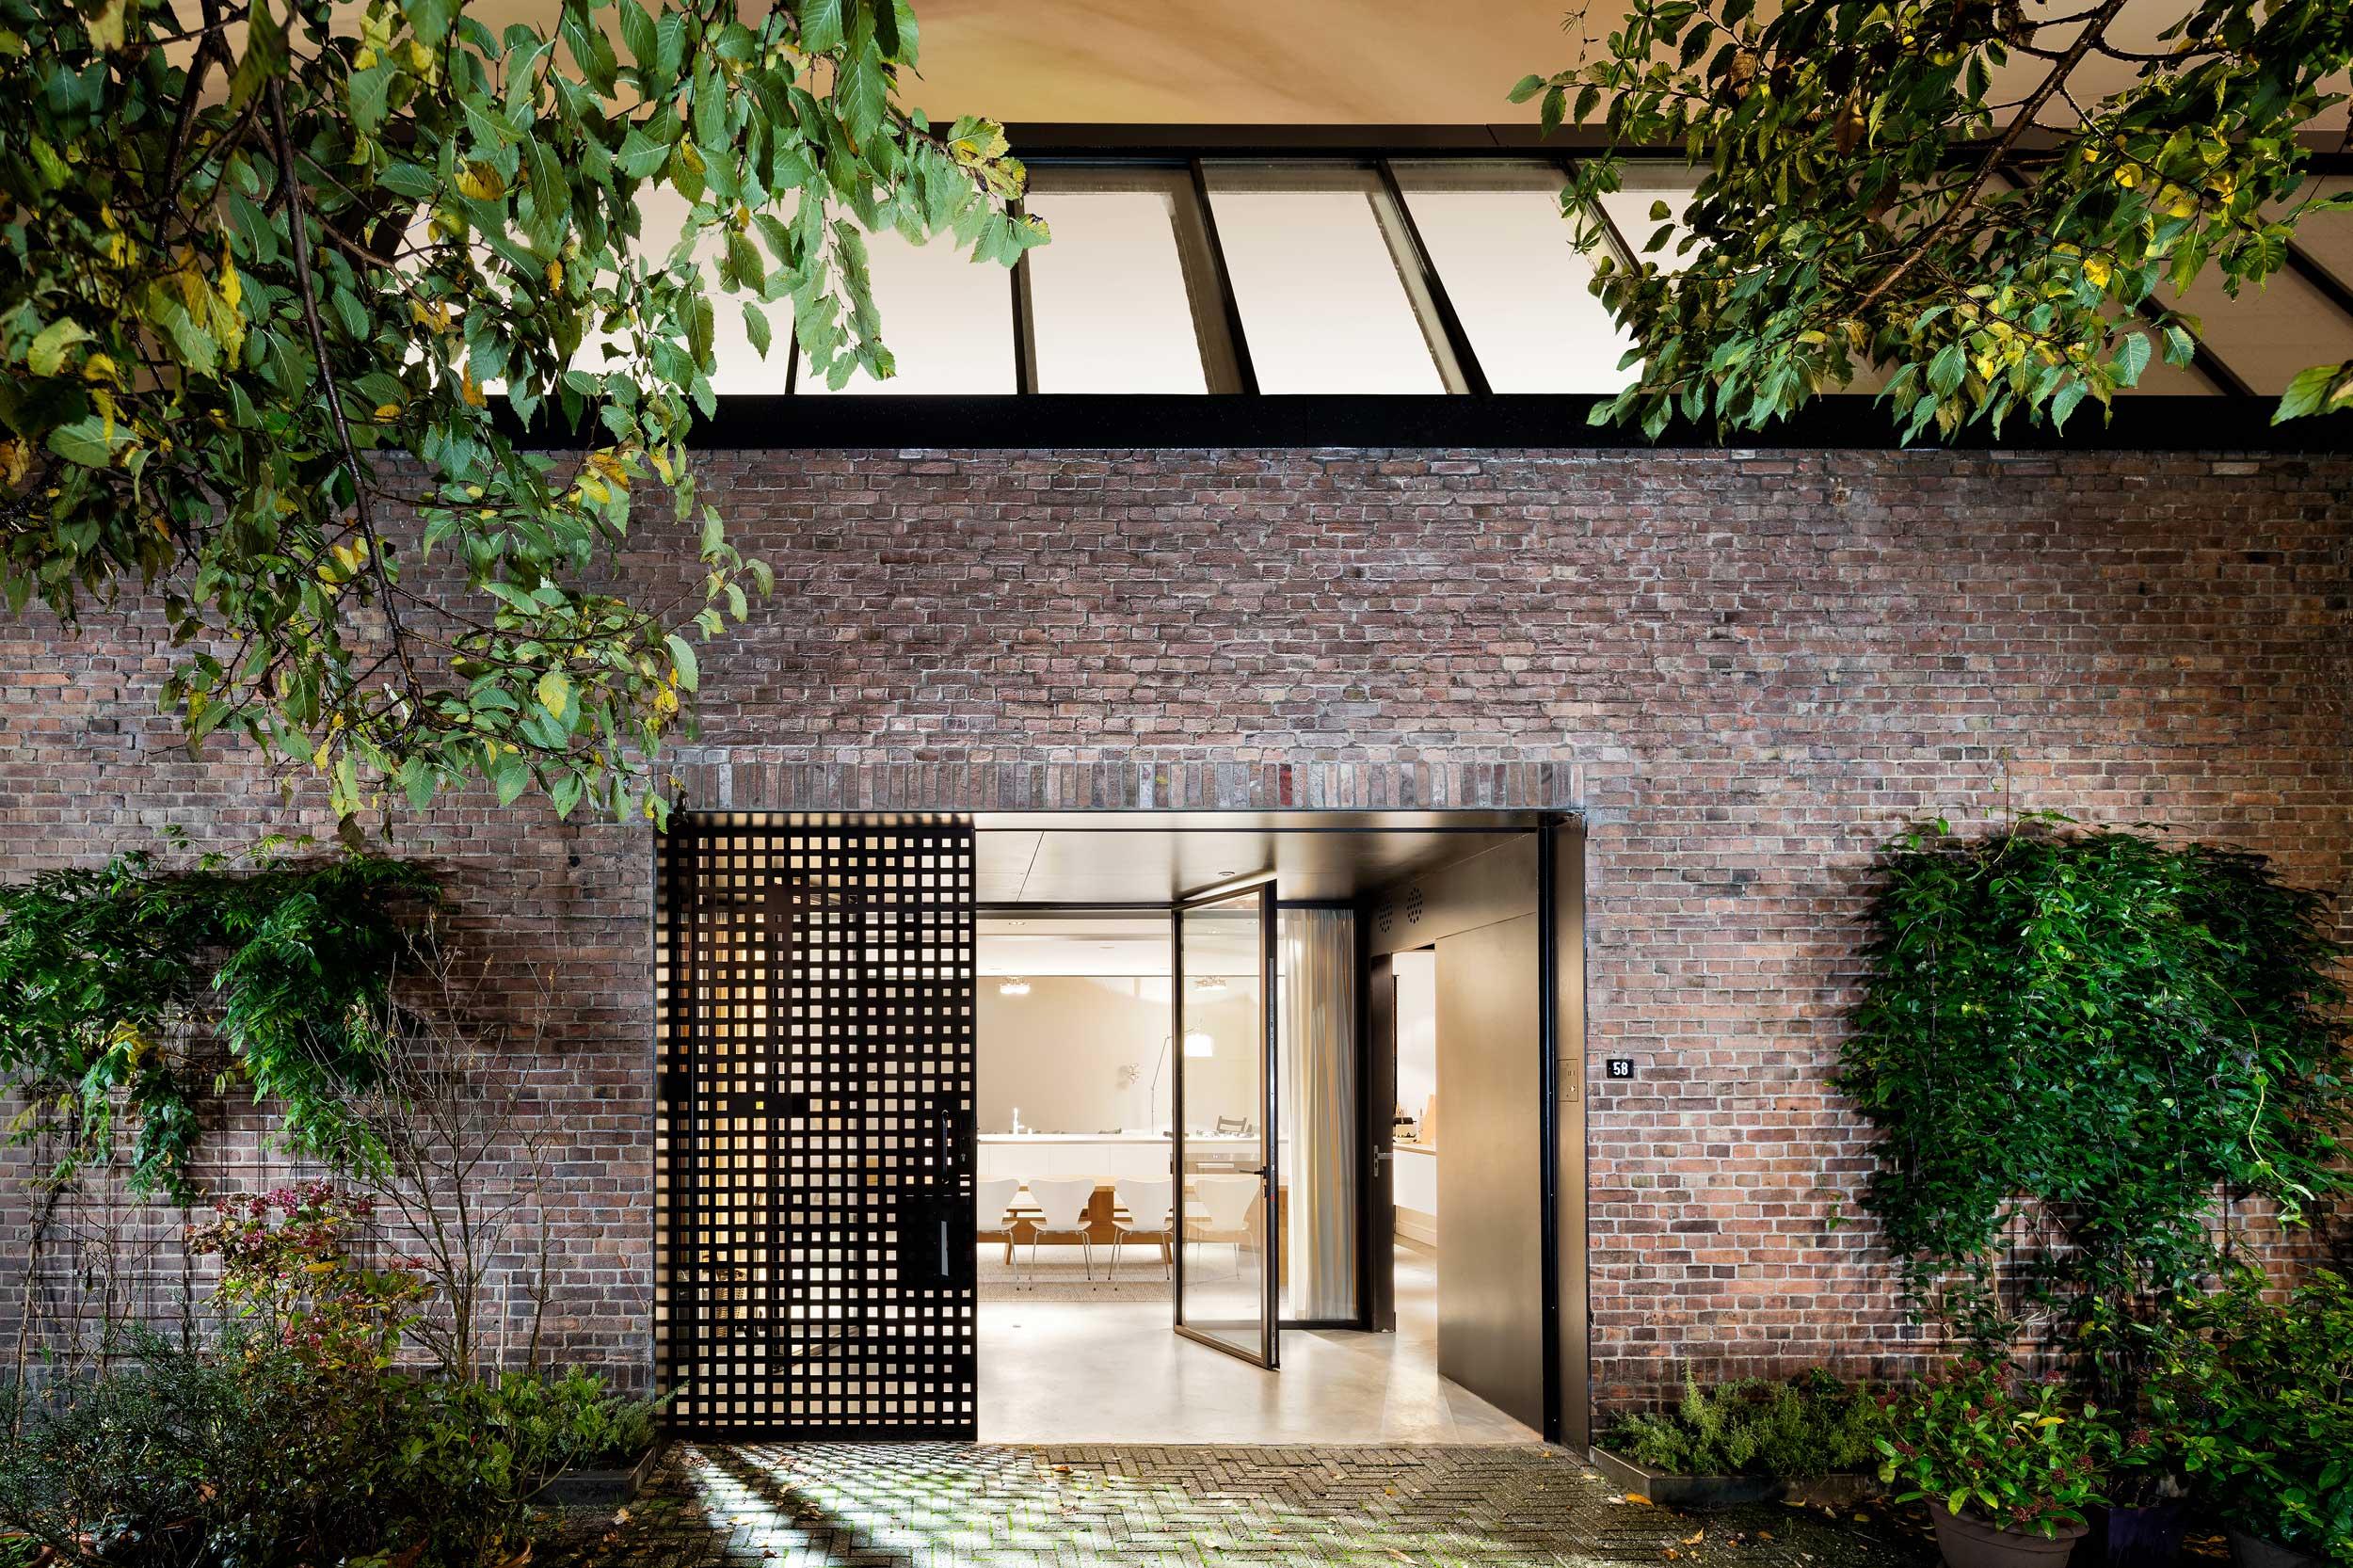 Tandwielenfabriek Amsterdam - fotograaf architectuur Chiel de Nooyer